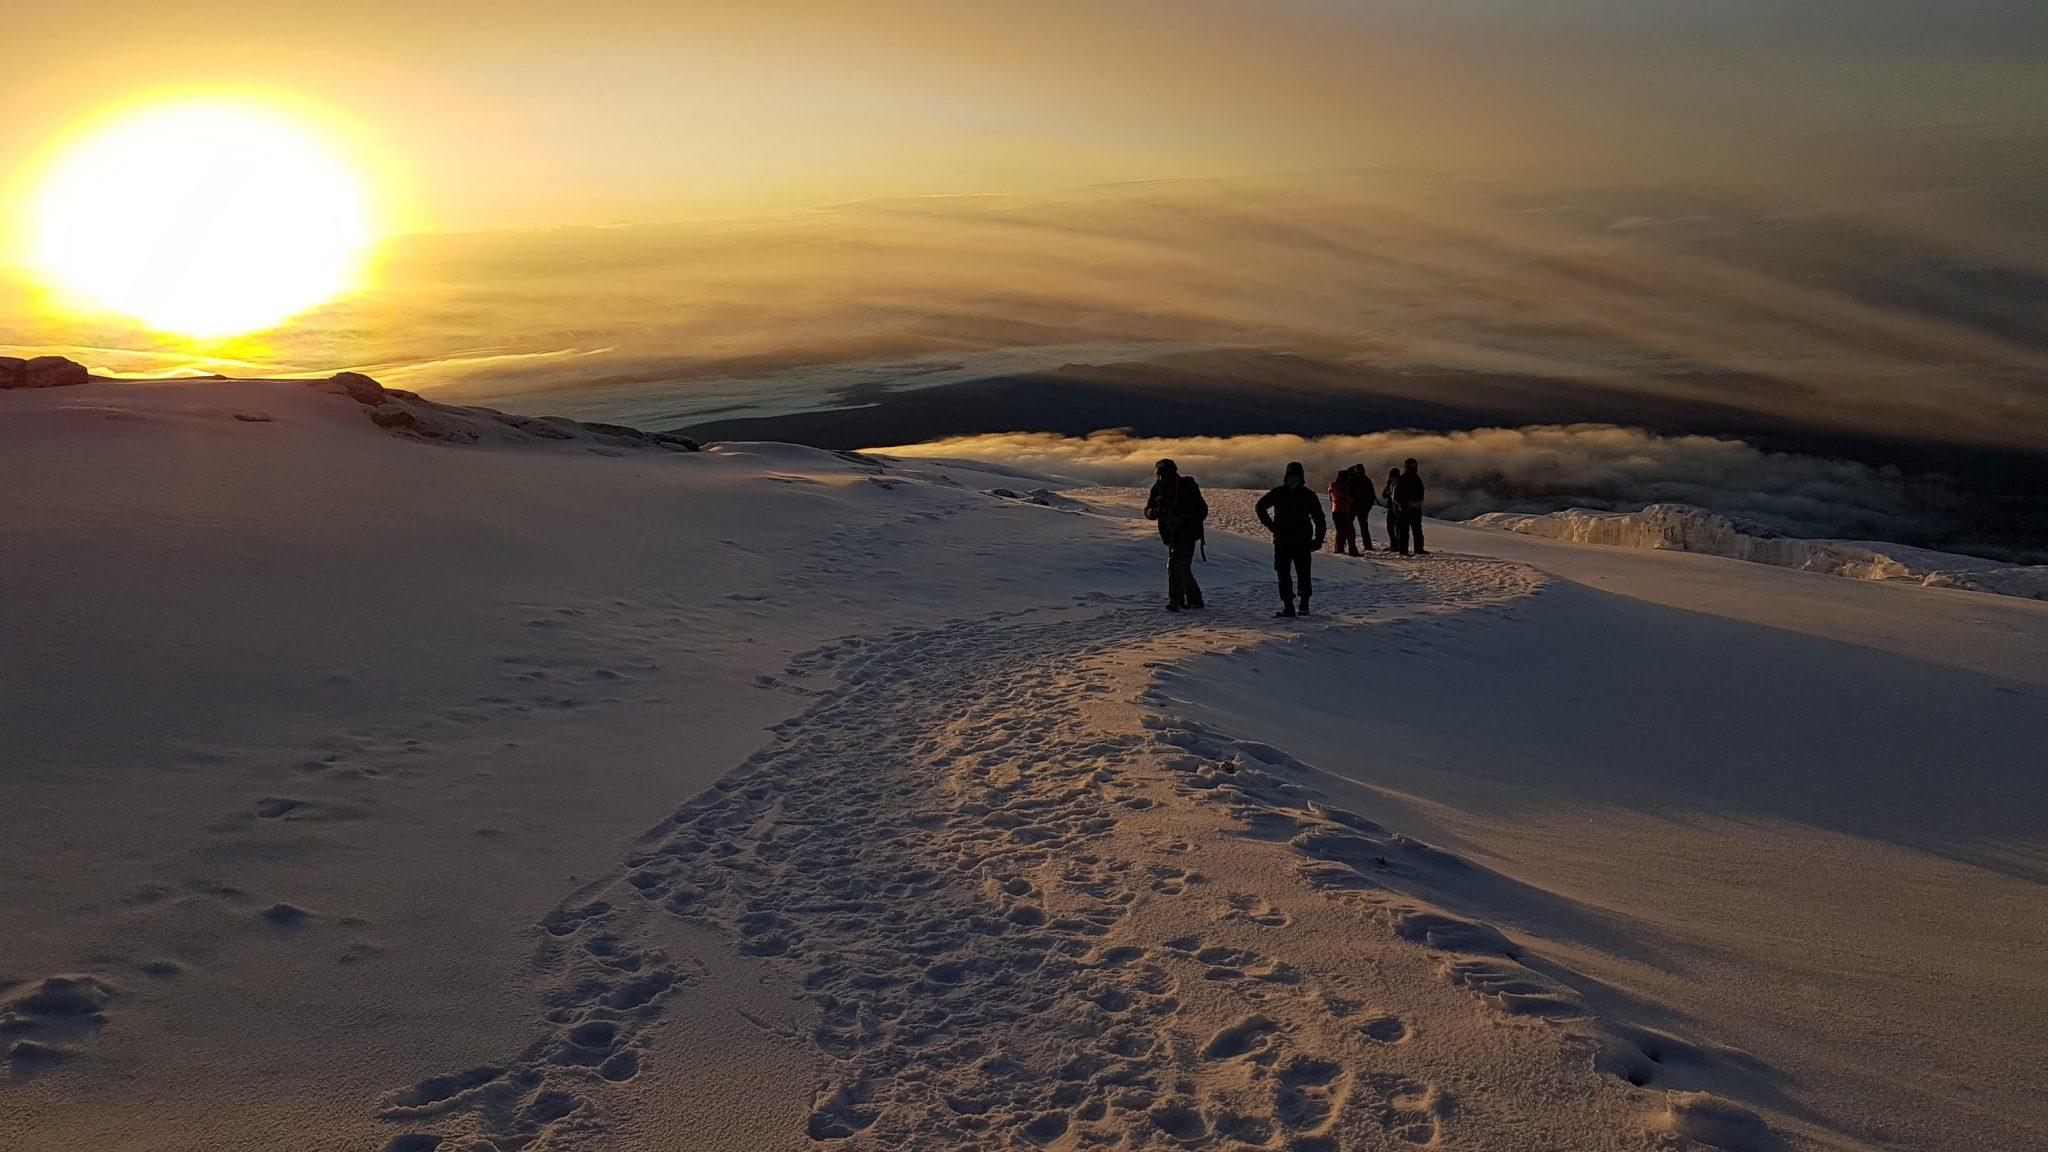 Trekking Kilimanjaro with Earth's Edge sunrise